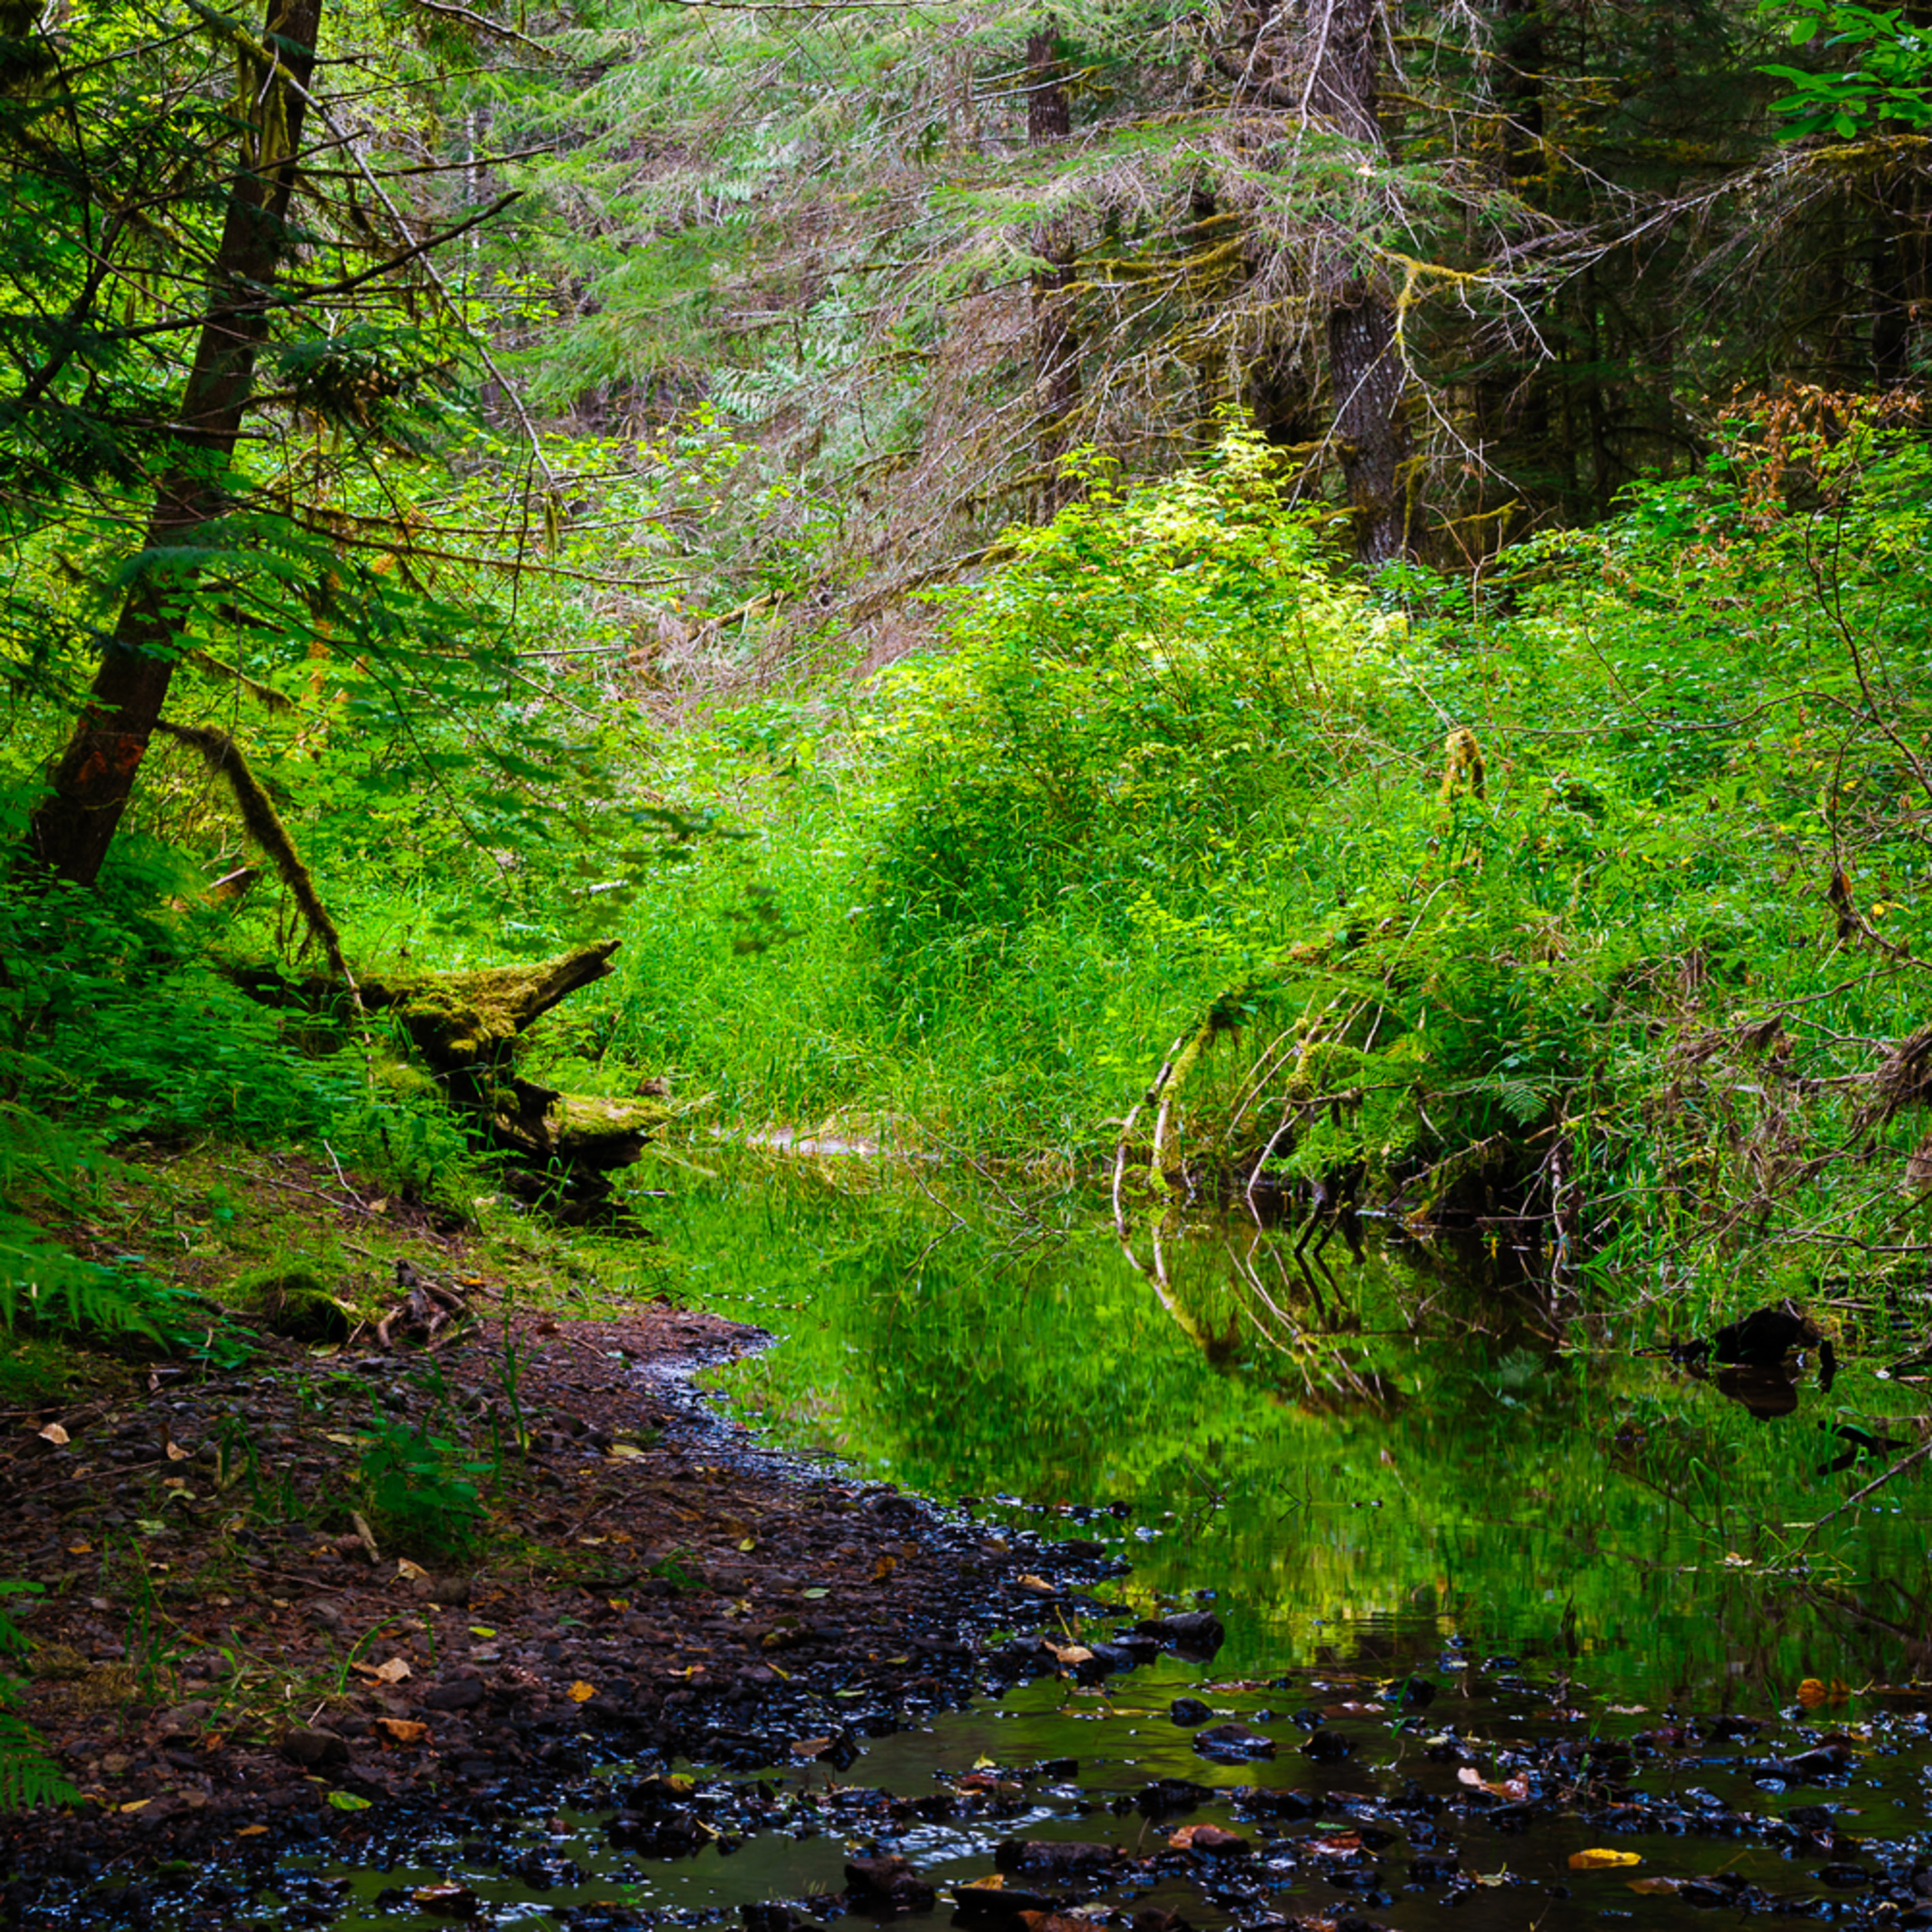 Woods creek randle washington 2016 gn4uik